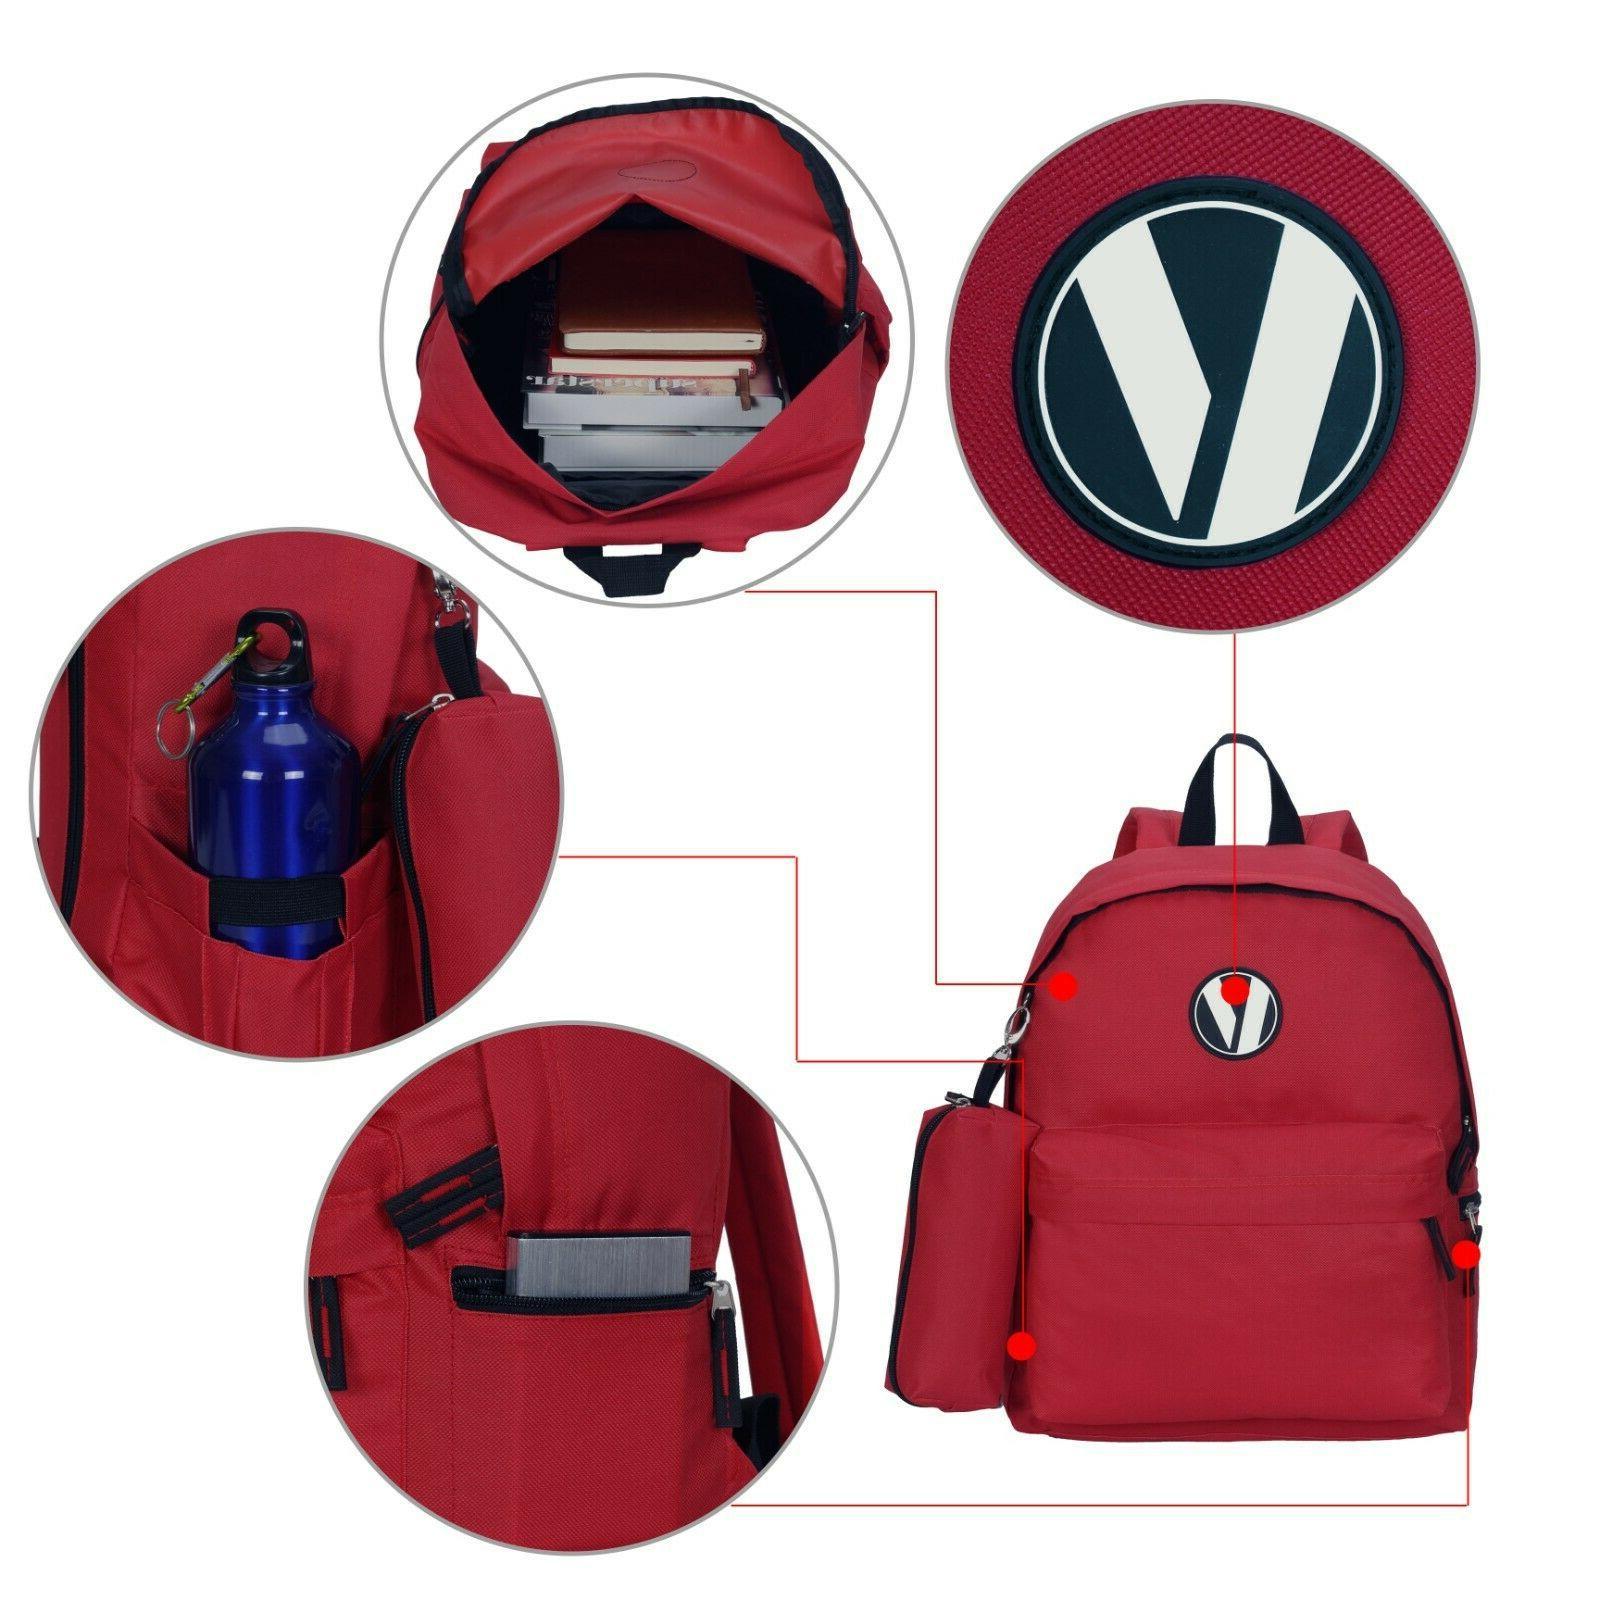 Cute Medium School Laptop Backpack Pencil Case Set Gifts